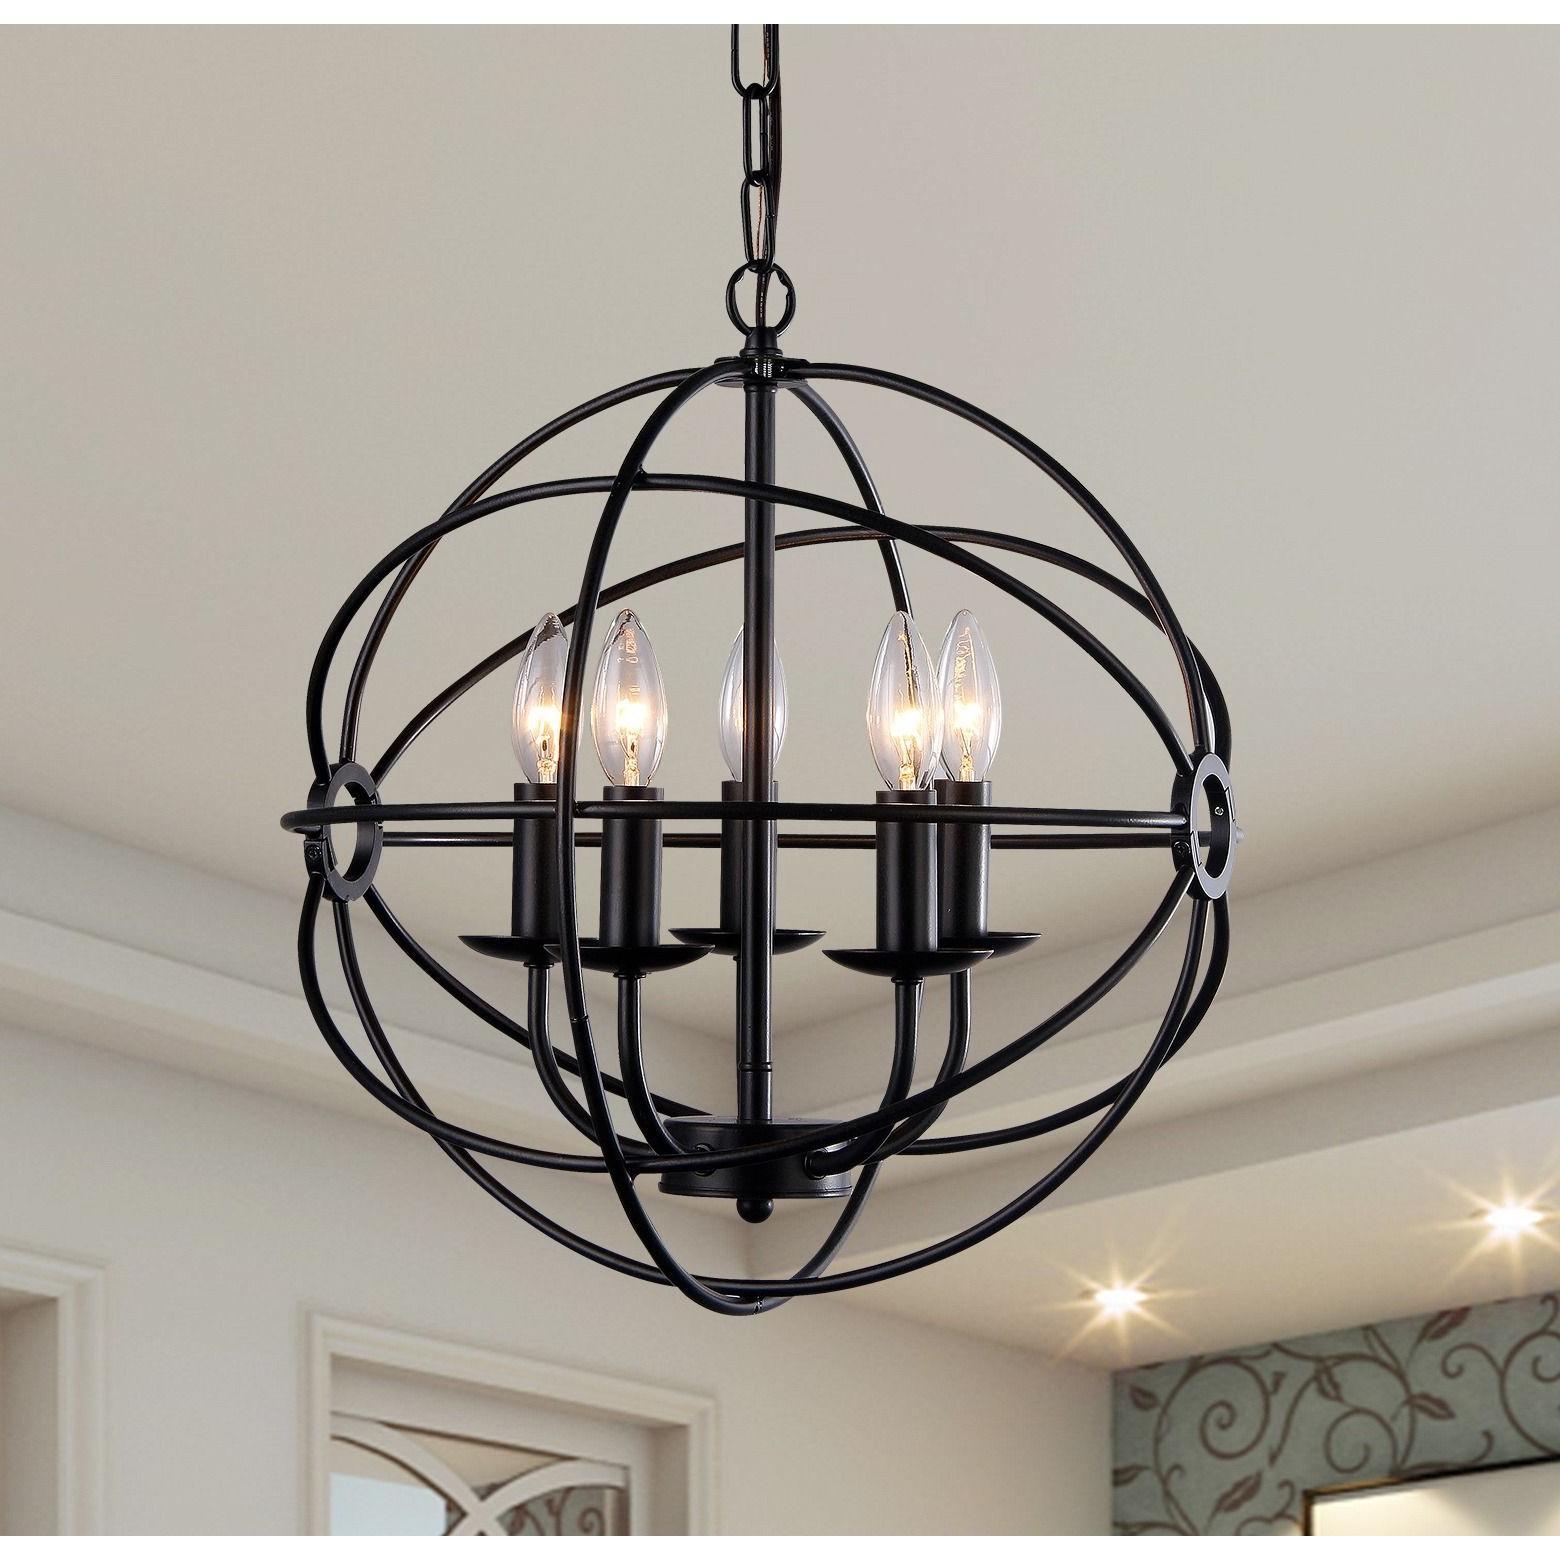 Well Liked Verlene Foyer 5 Light Globe Chandeliers In Warehouse Of Tiffany Meila 5 Light Black 16 Inch Spherical (View 7 of 25)